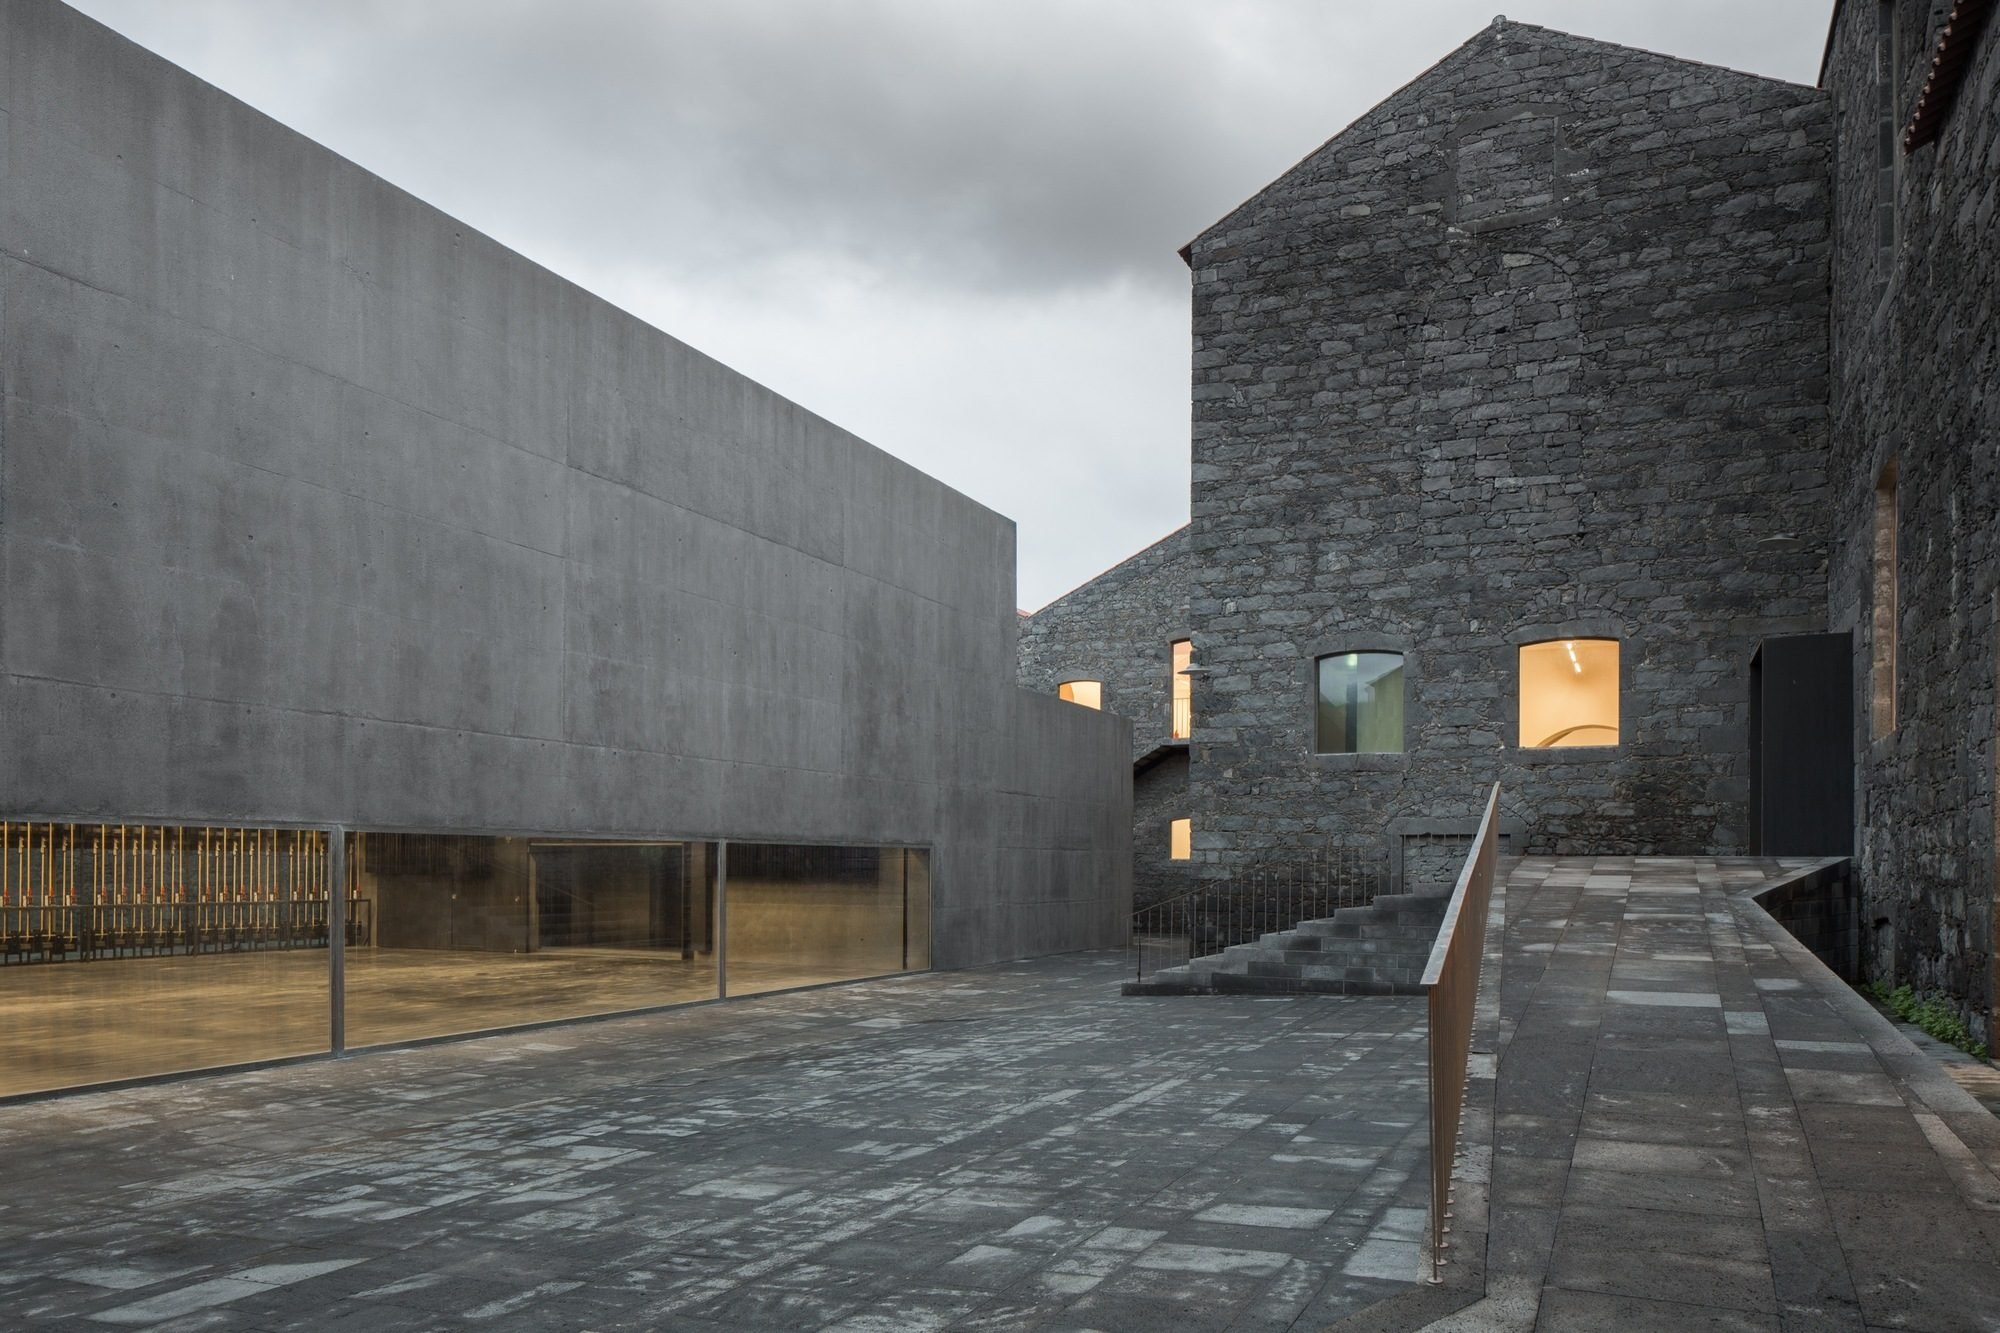 Centro de Artes Contemporâneas, nos Açores, está entre os nomeados (Fotos: Observador).